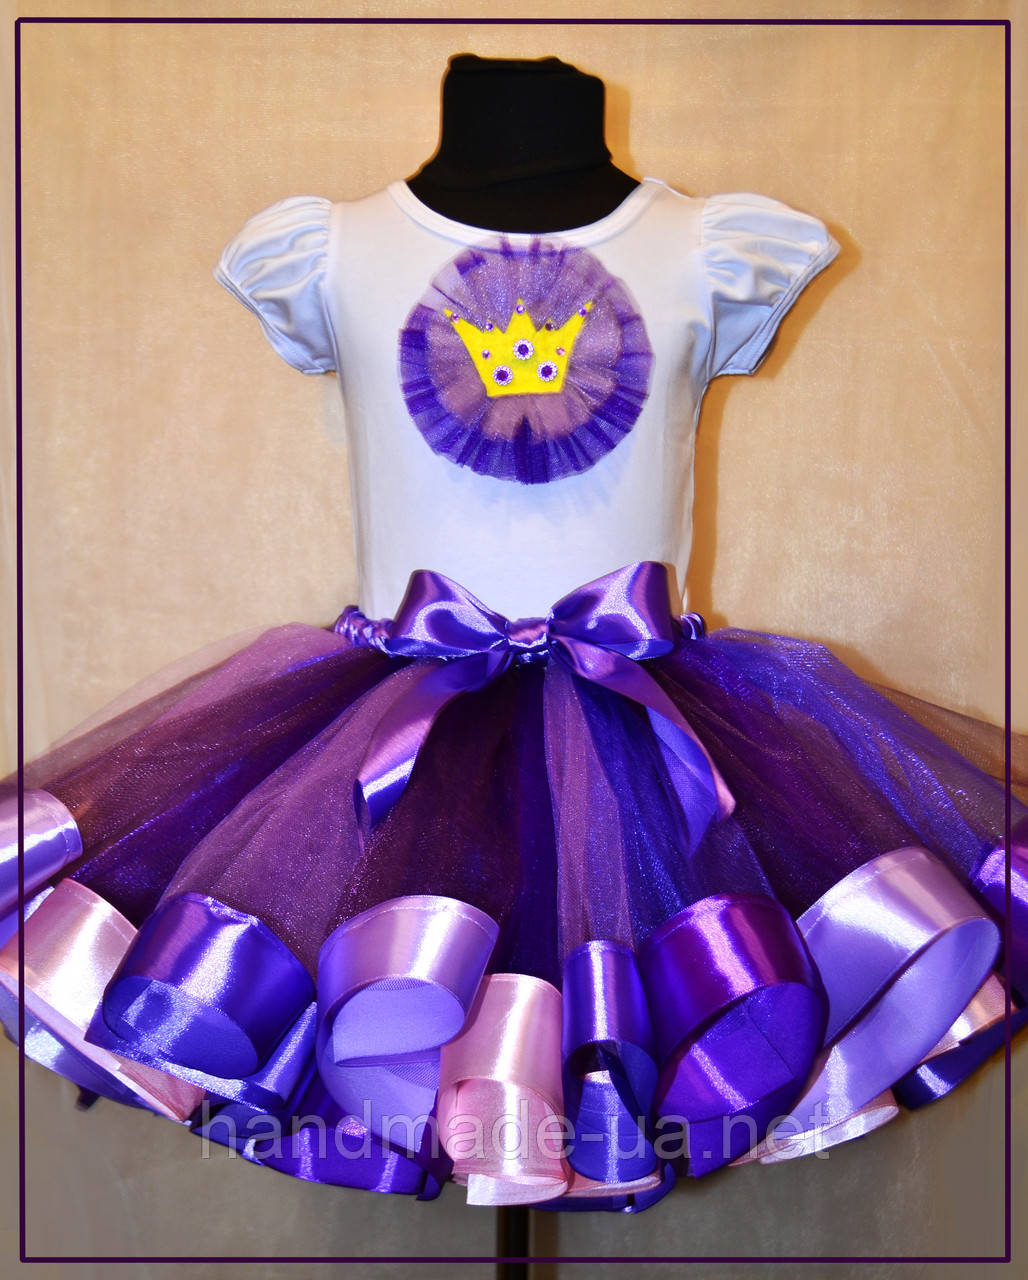 d5c4aaea01e Фиолетовая юбка пачка с лентами - Peek-a-Boo в Мариуполе